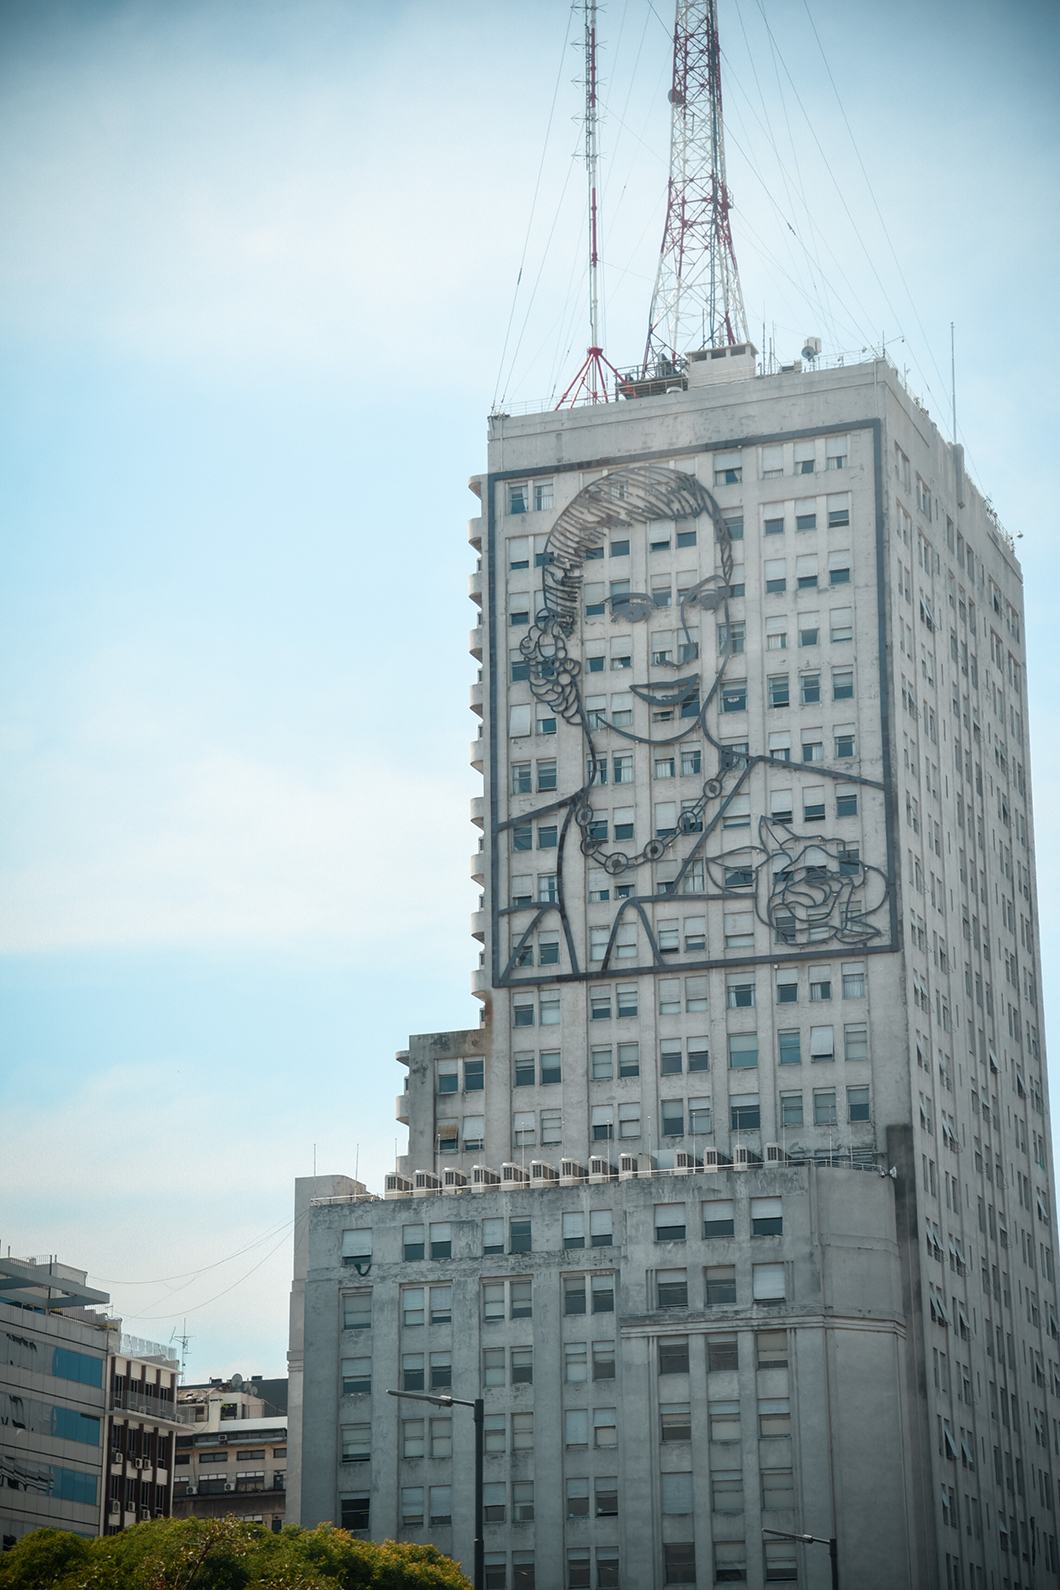 Building Eva Peron à Buenos Aires